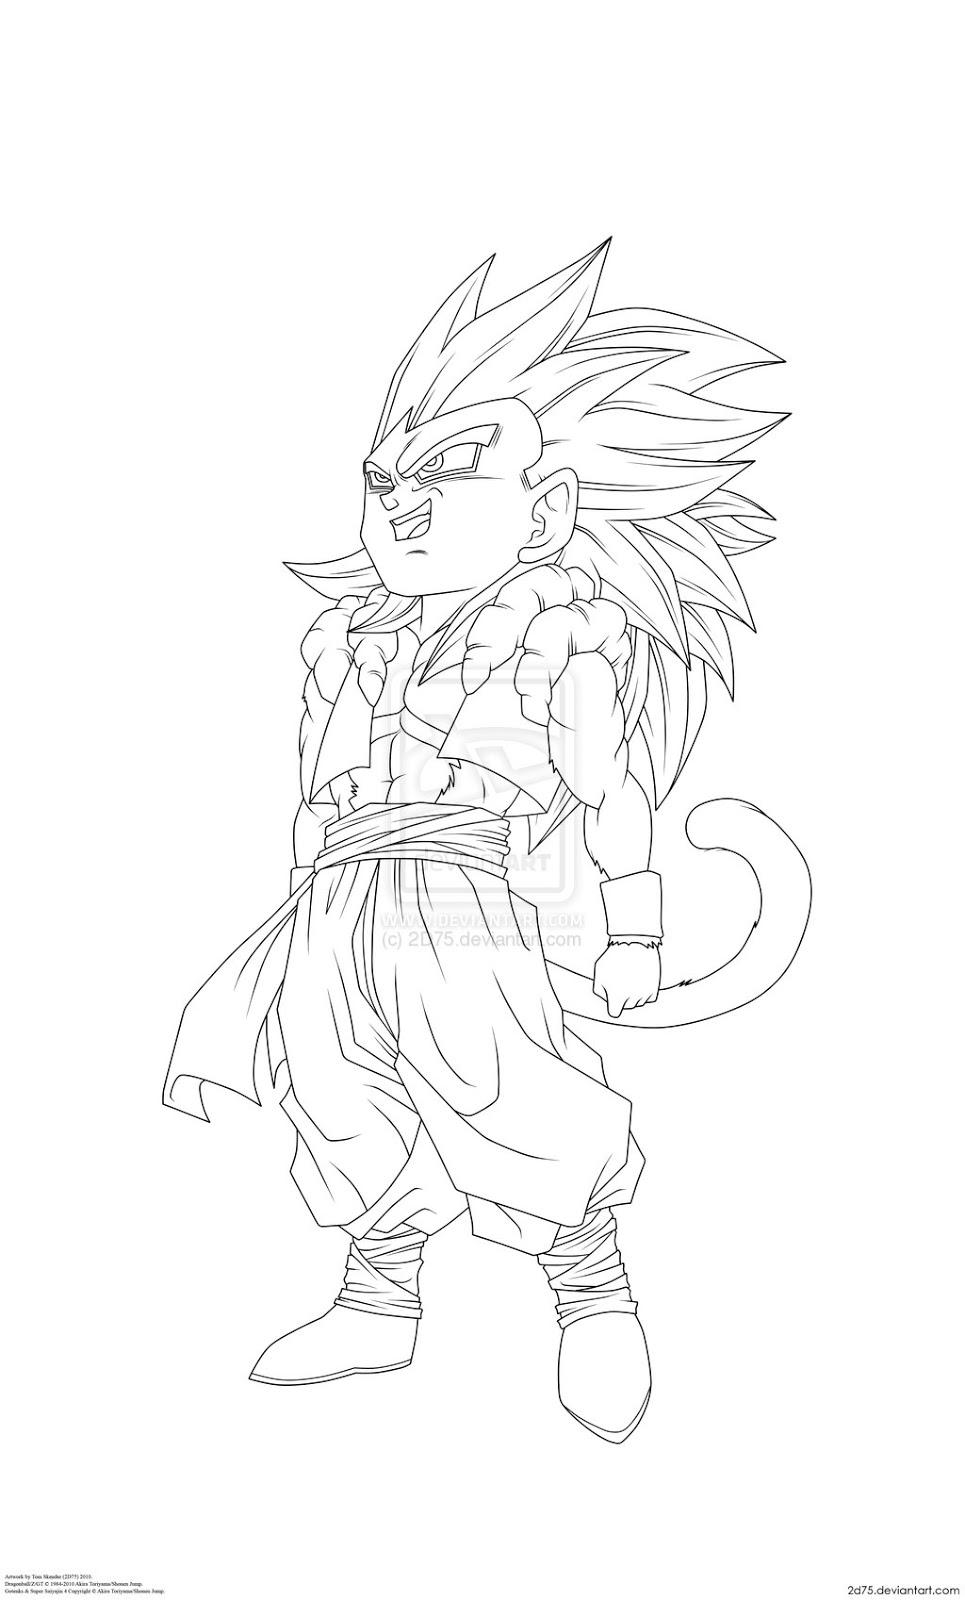 gotenks coloring pages - coloriage dragon ball super krilin